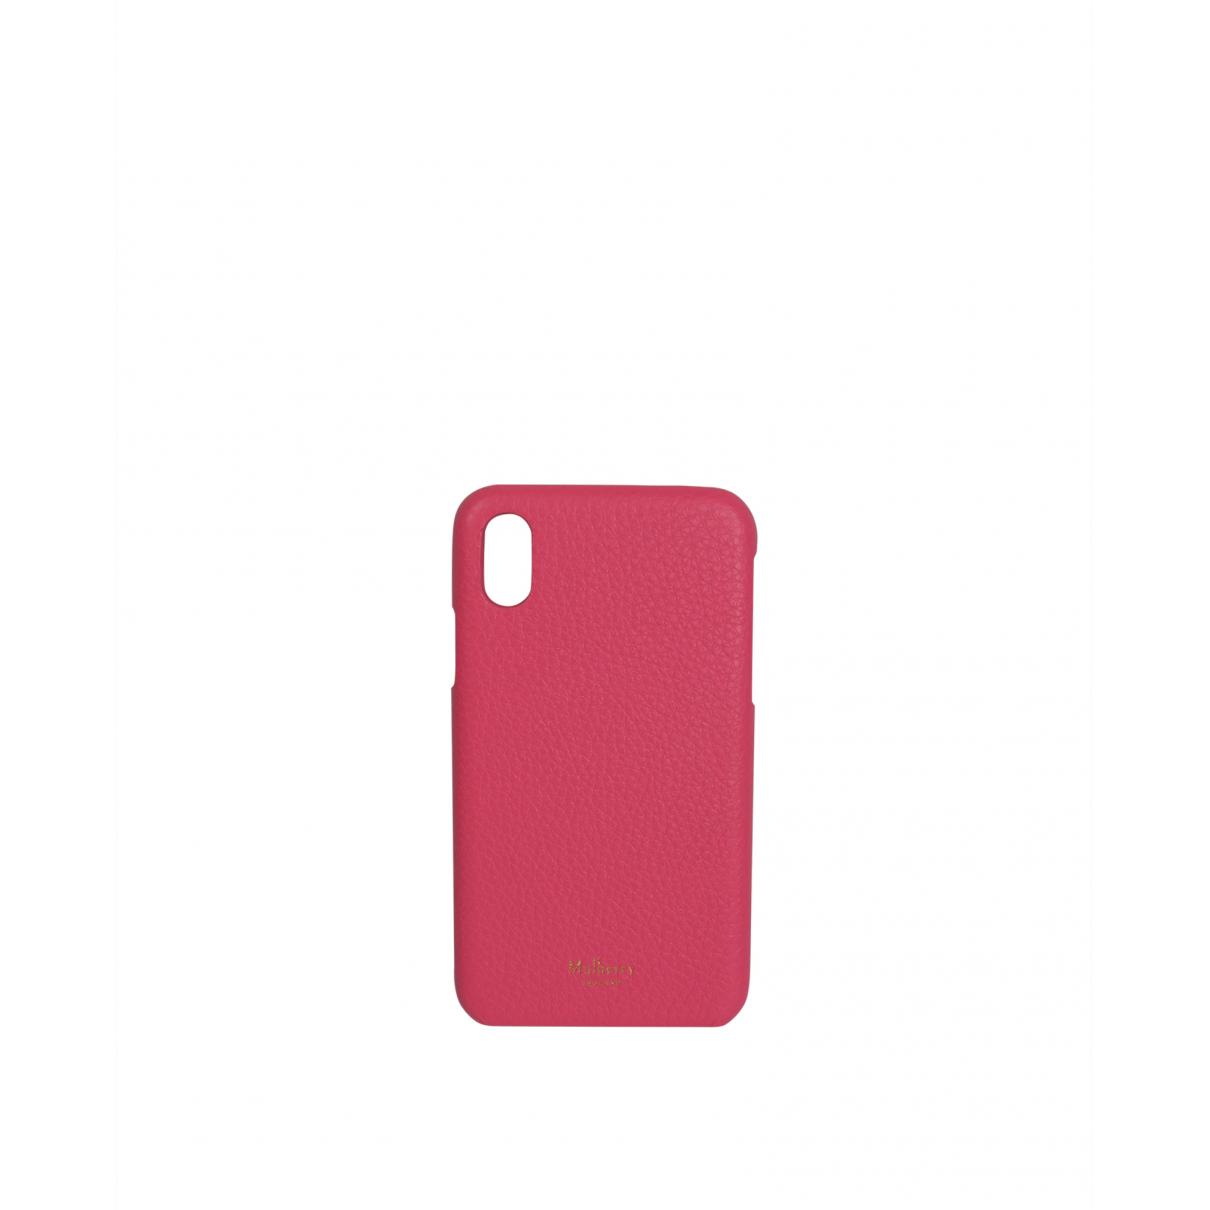 Funda iphone de Cuero Mulberry